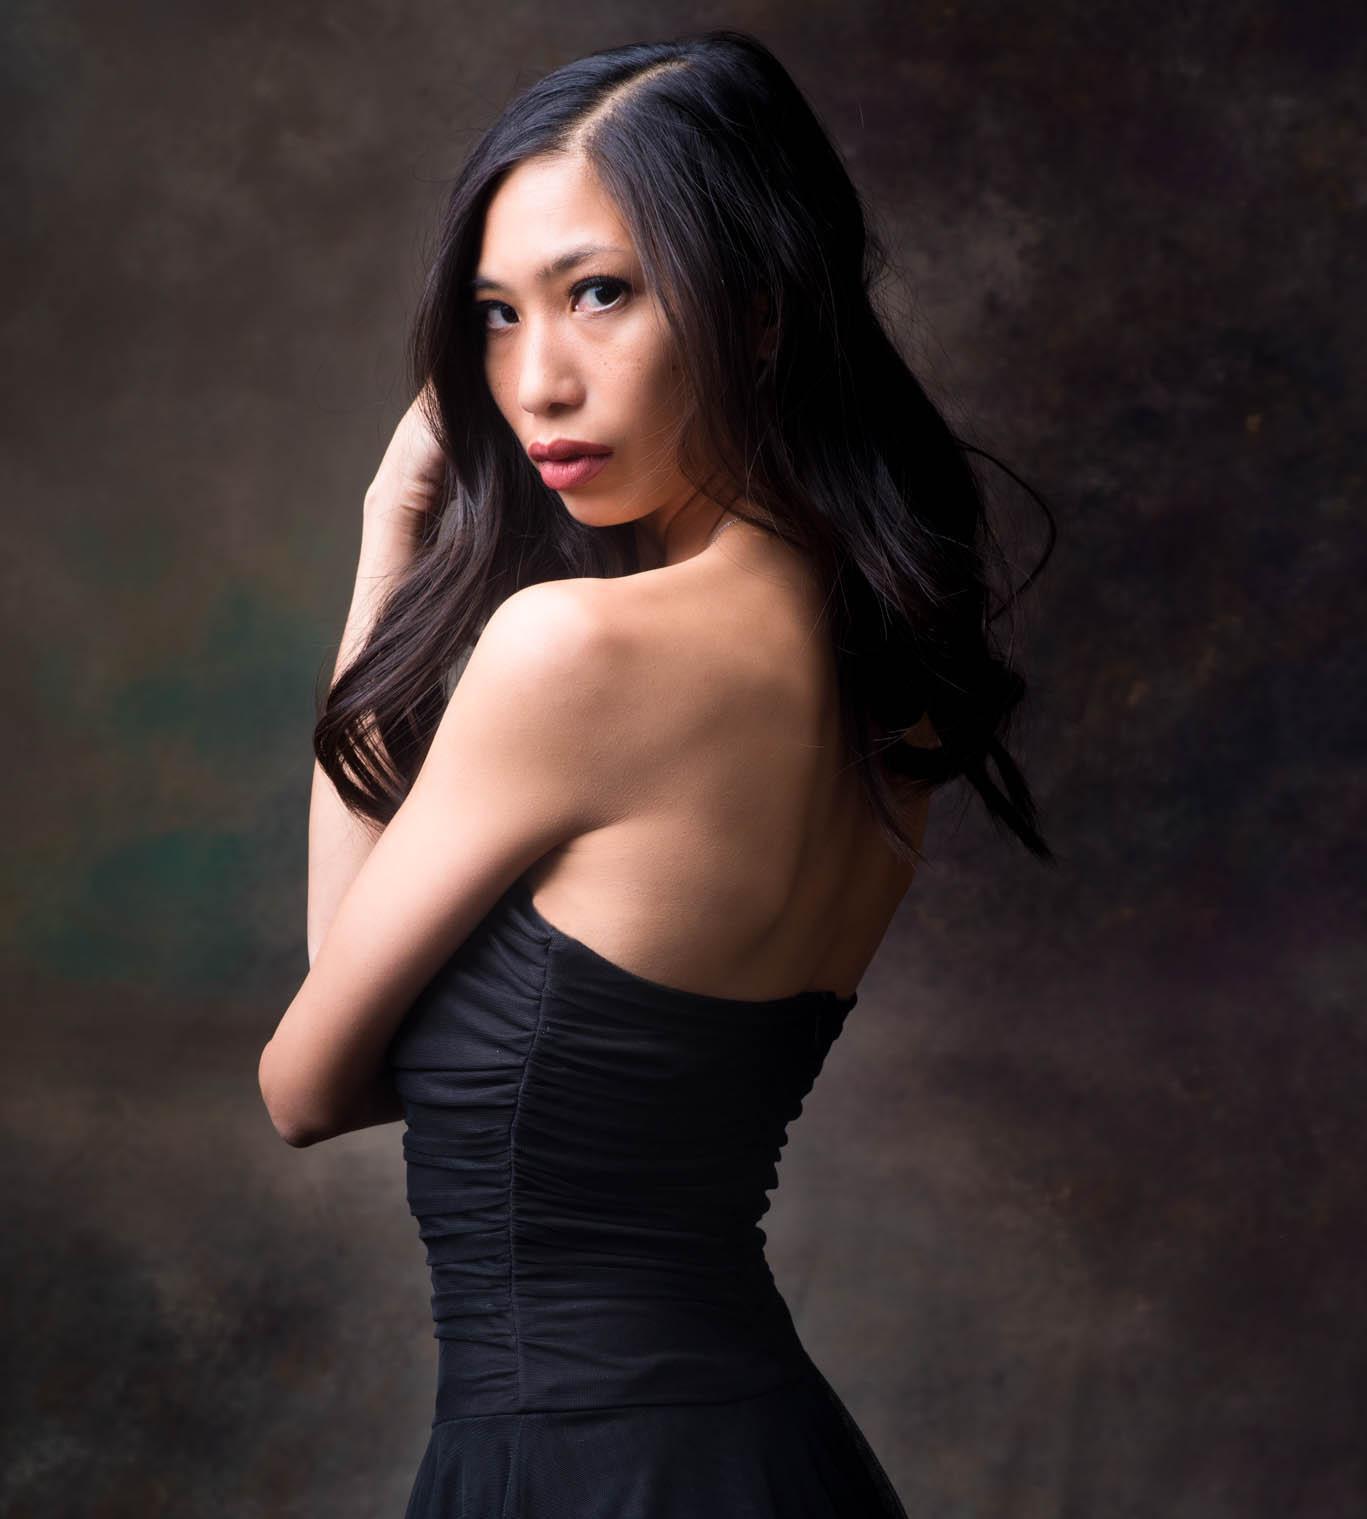 Trang Saterlee